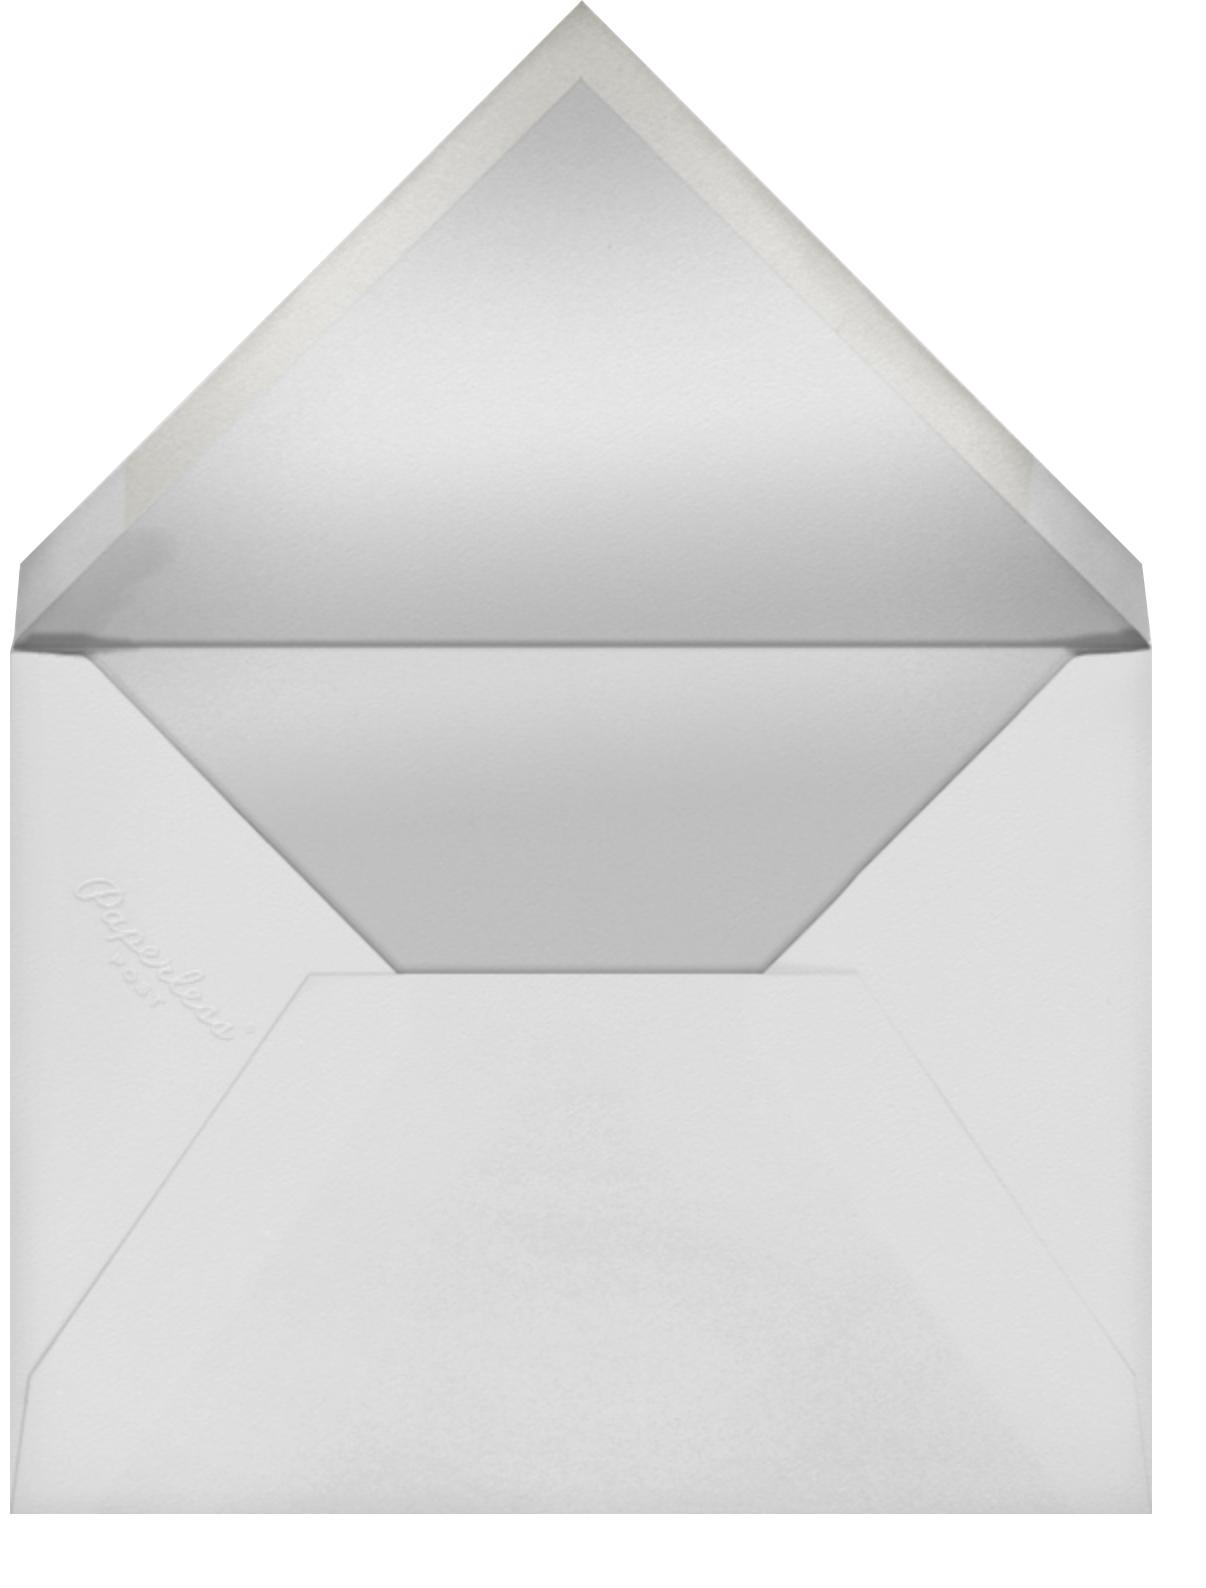 Phoebe (Menu) - Liberty - Envelope